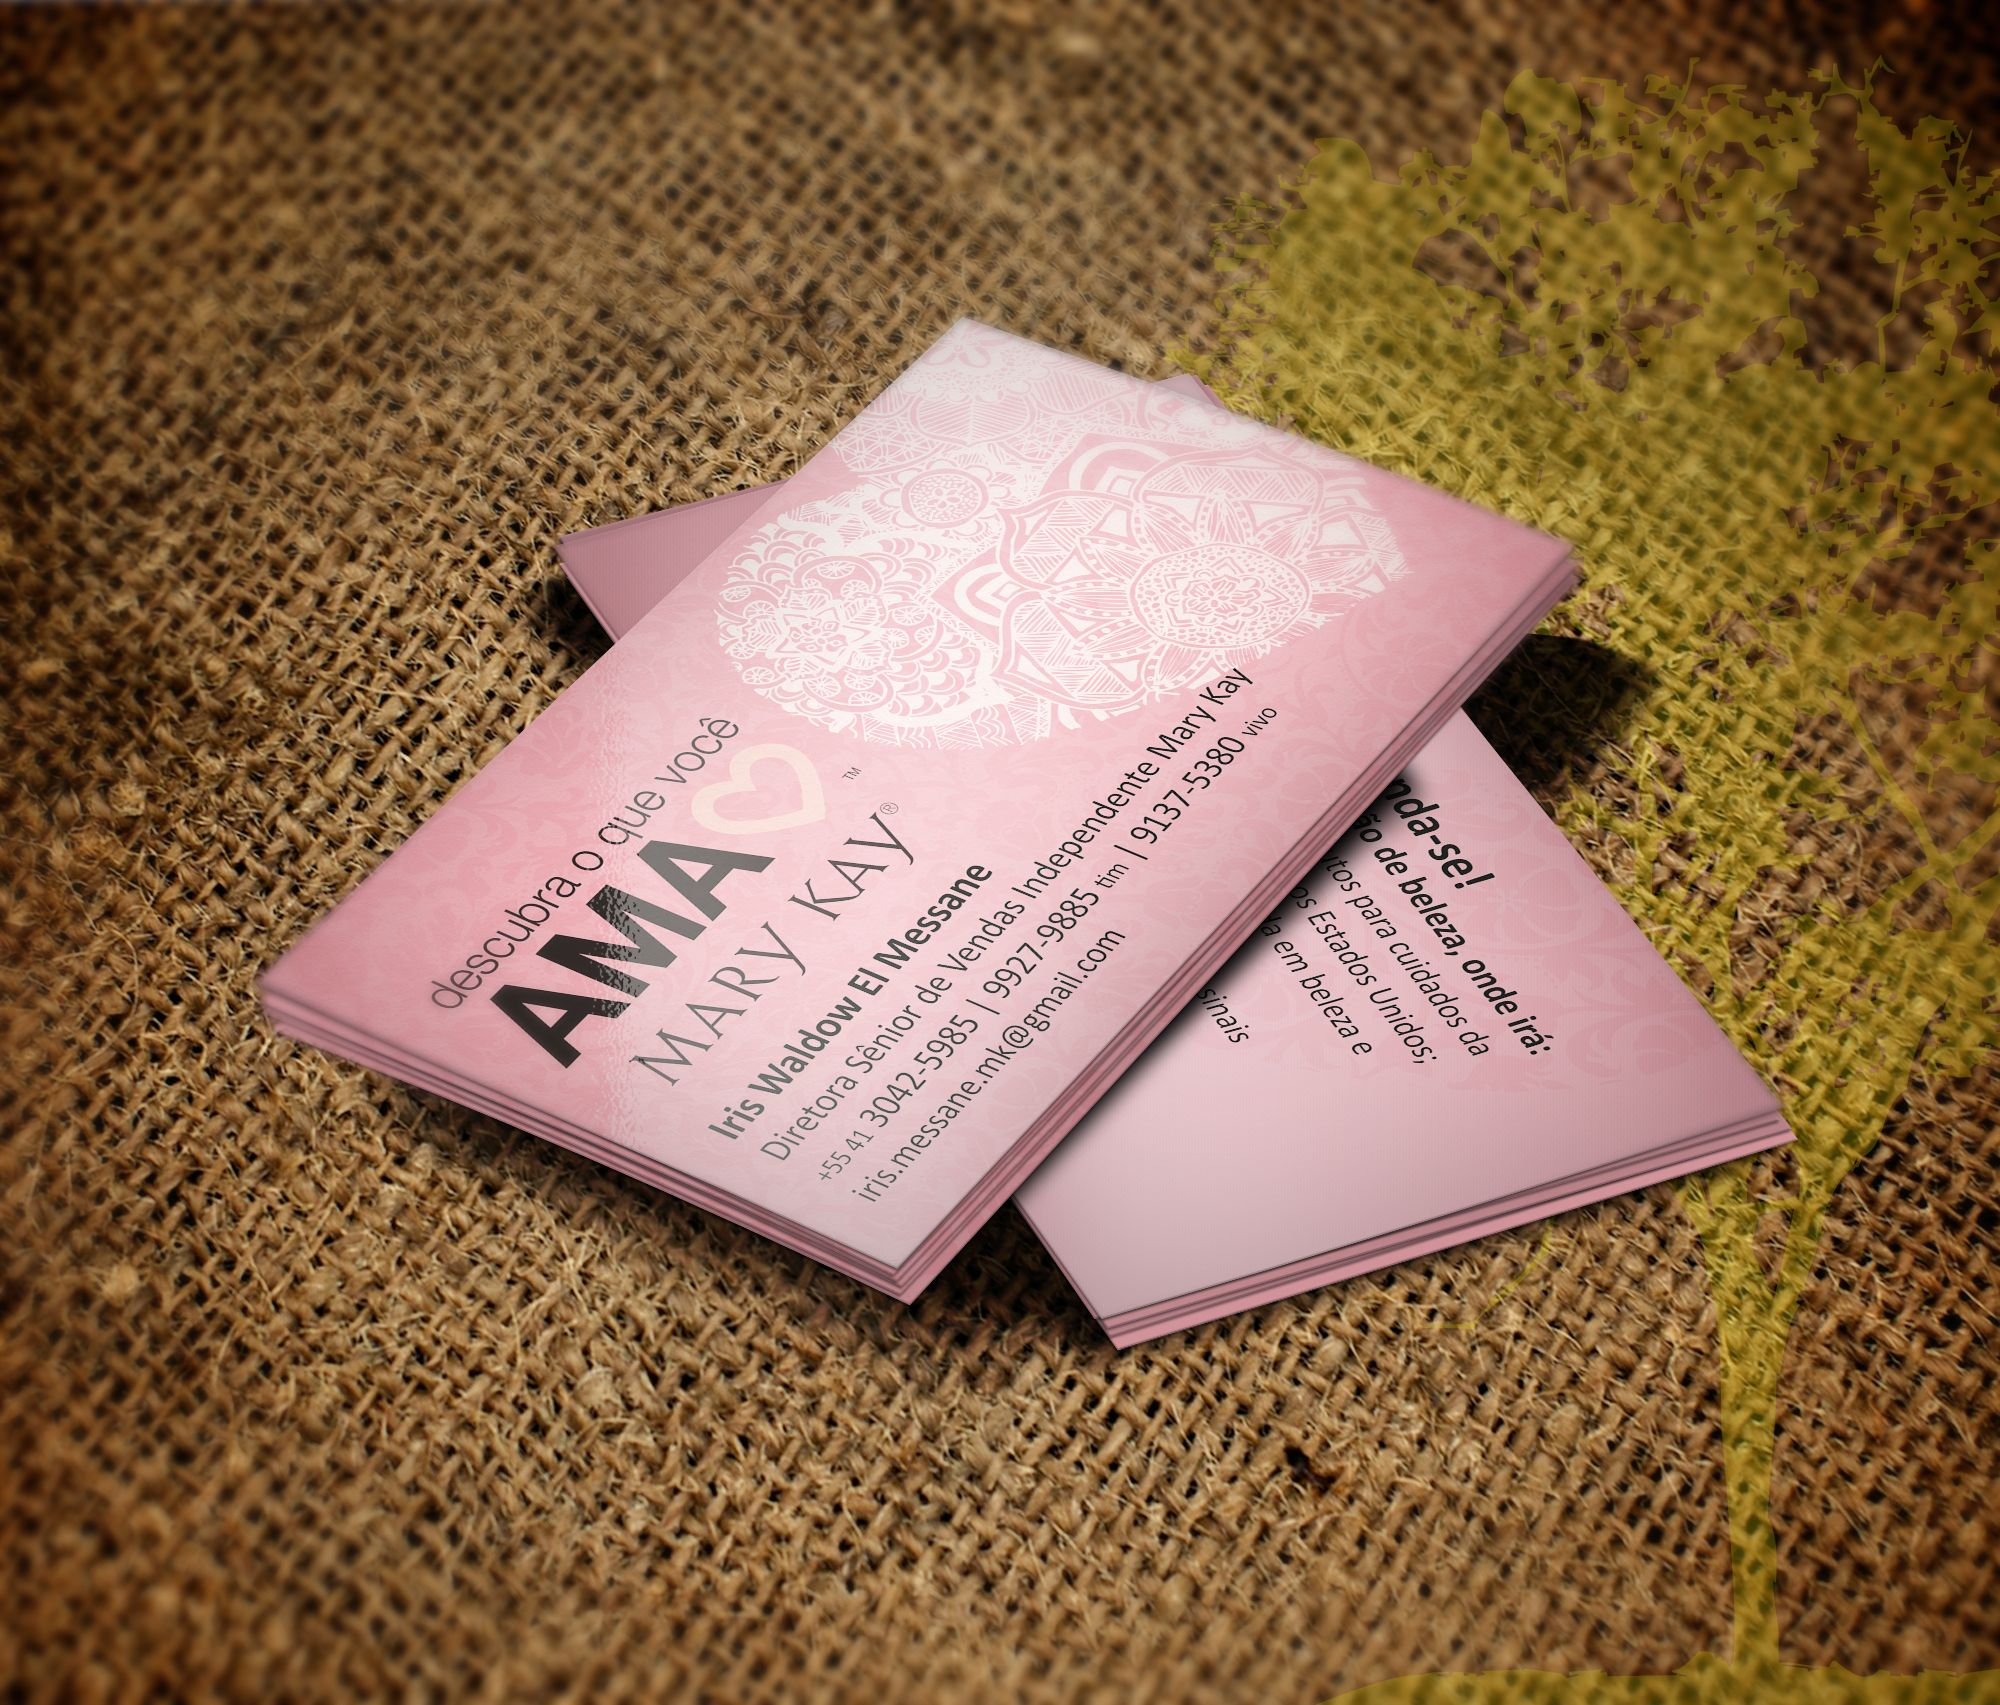 business card independent beauty consultant mary kay by martin cartatildeo de as para diretora mary kay